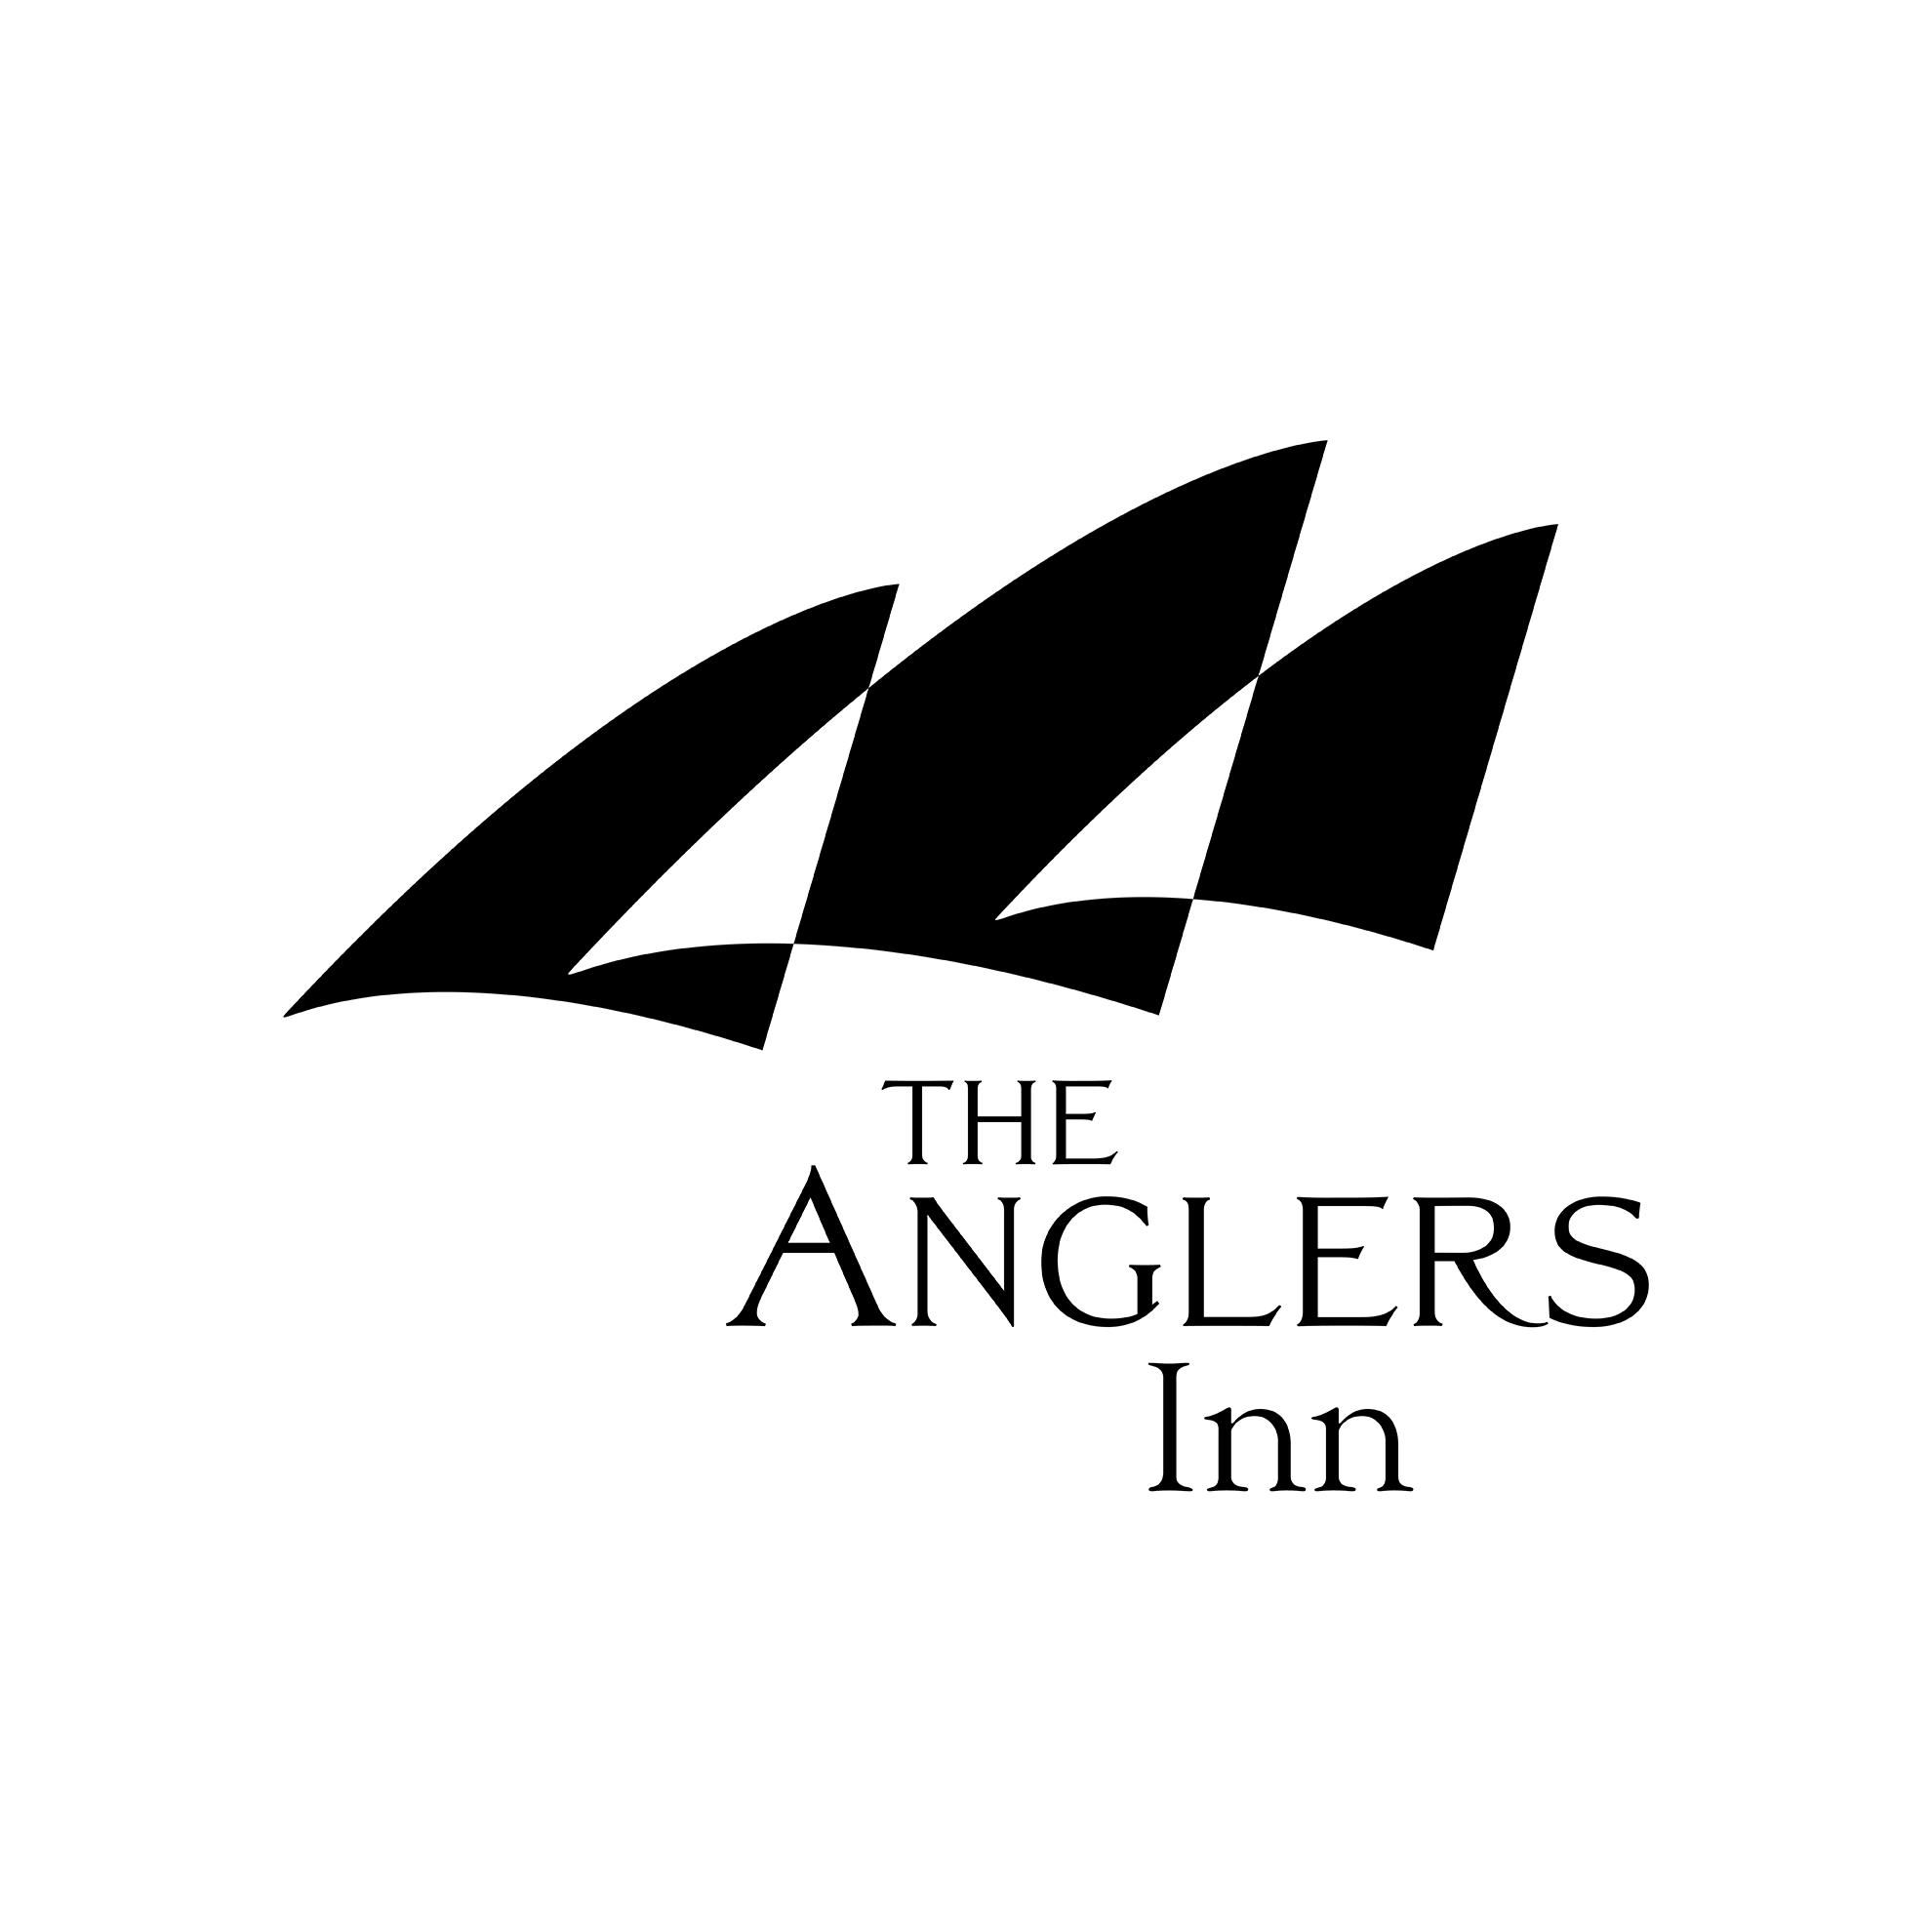 The Anglers Inn logo